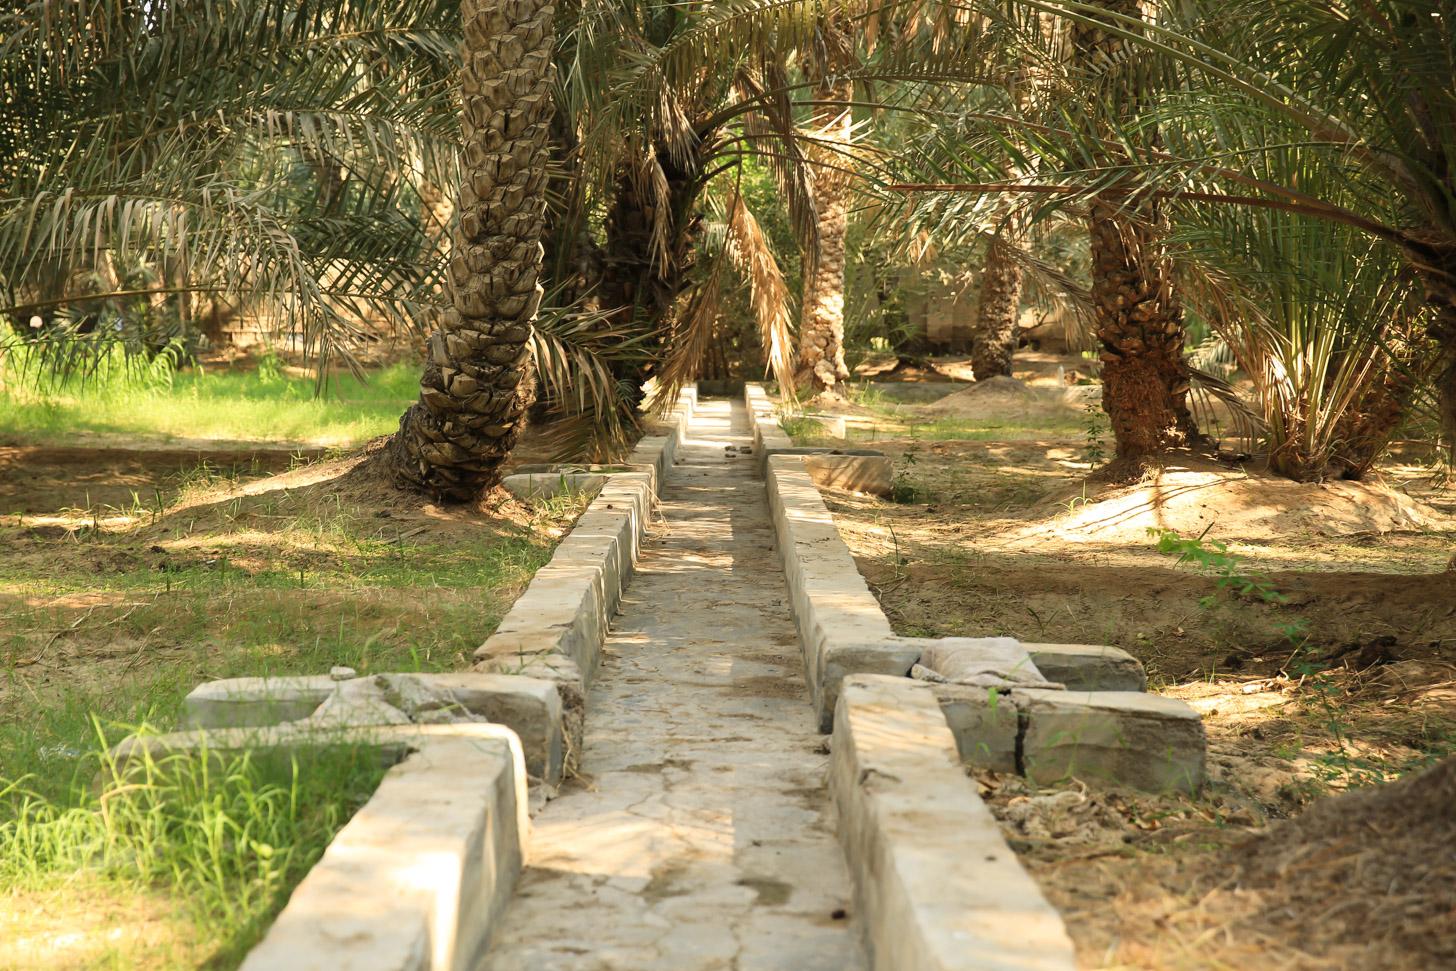 De oases van Al Ain